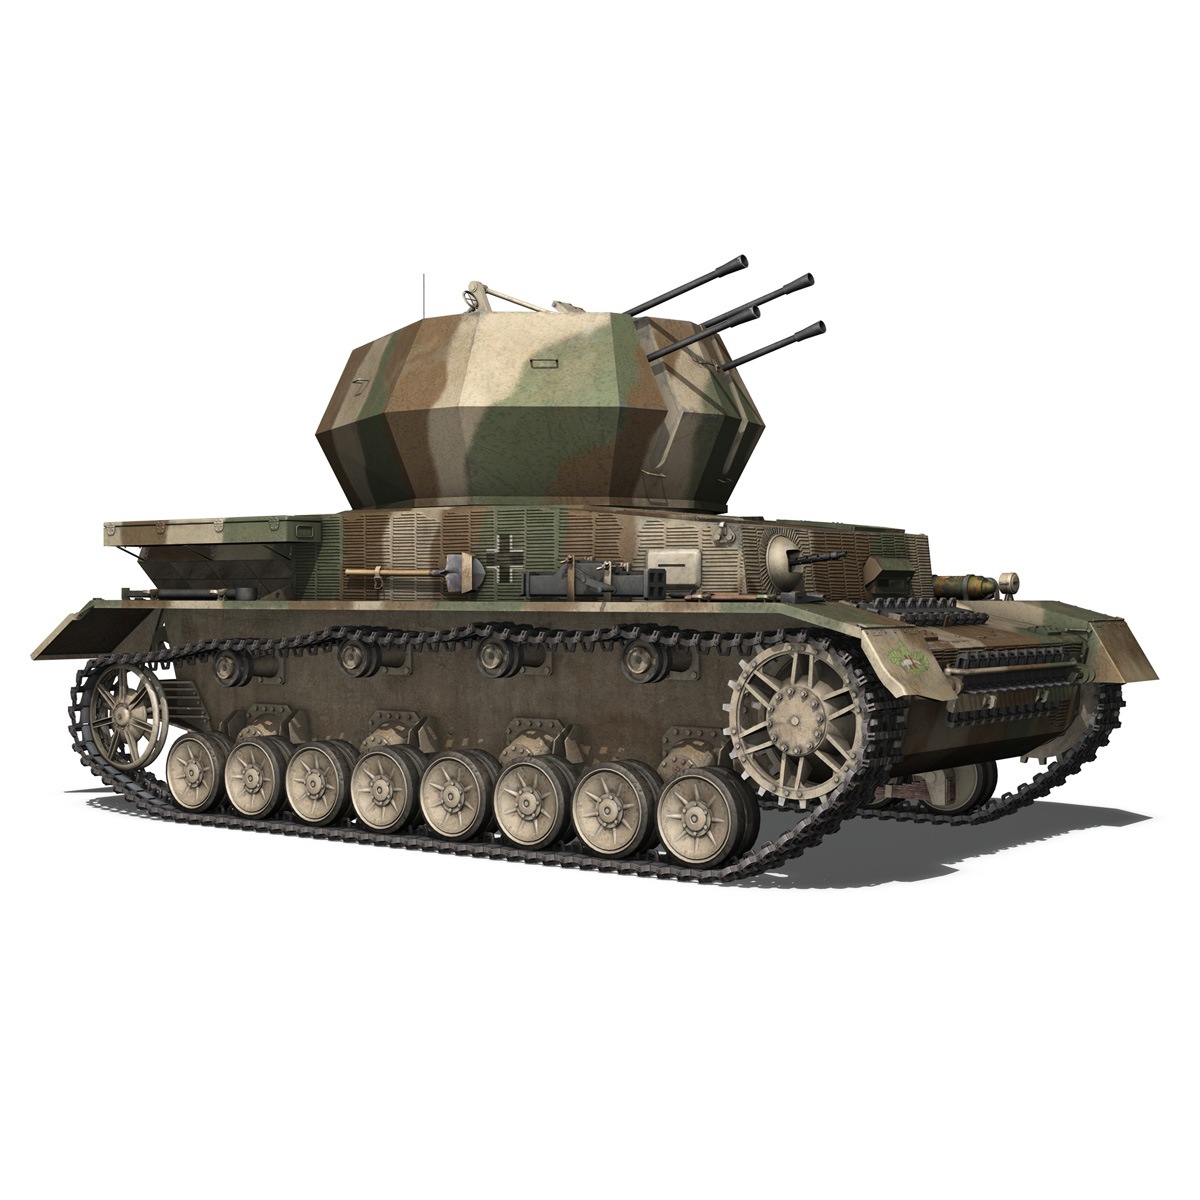 flakpanzer iv – wirbelwind – spzjgabt 654 3d model 3ds fbx c4d lwo obj 282310